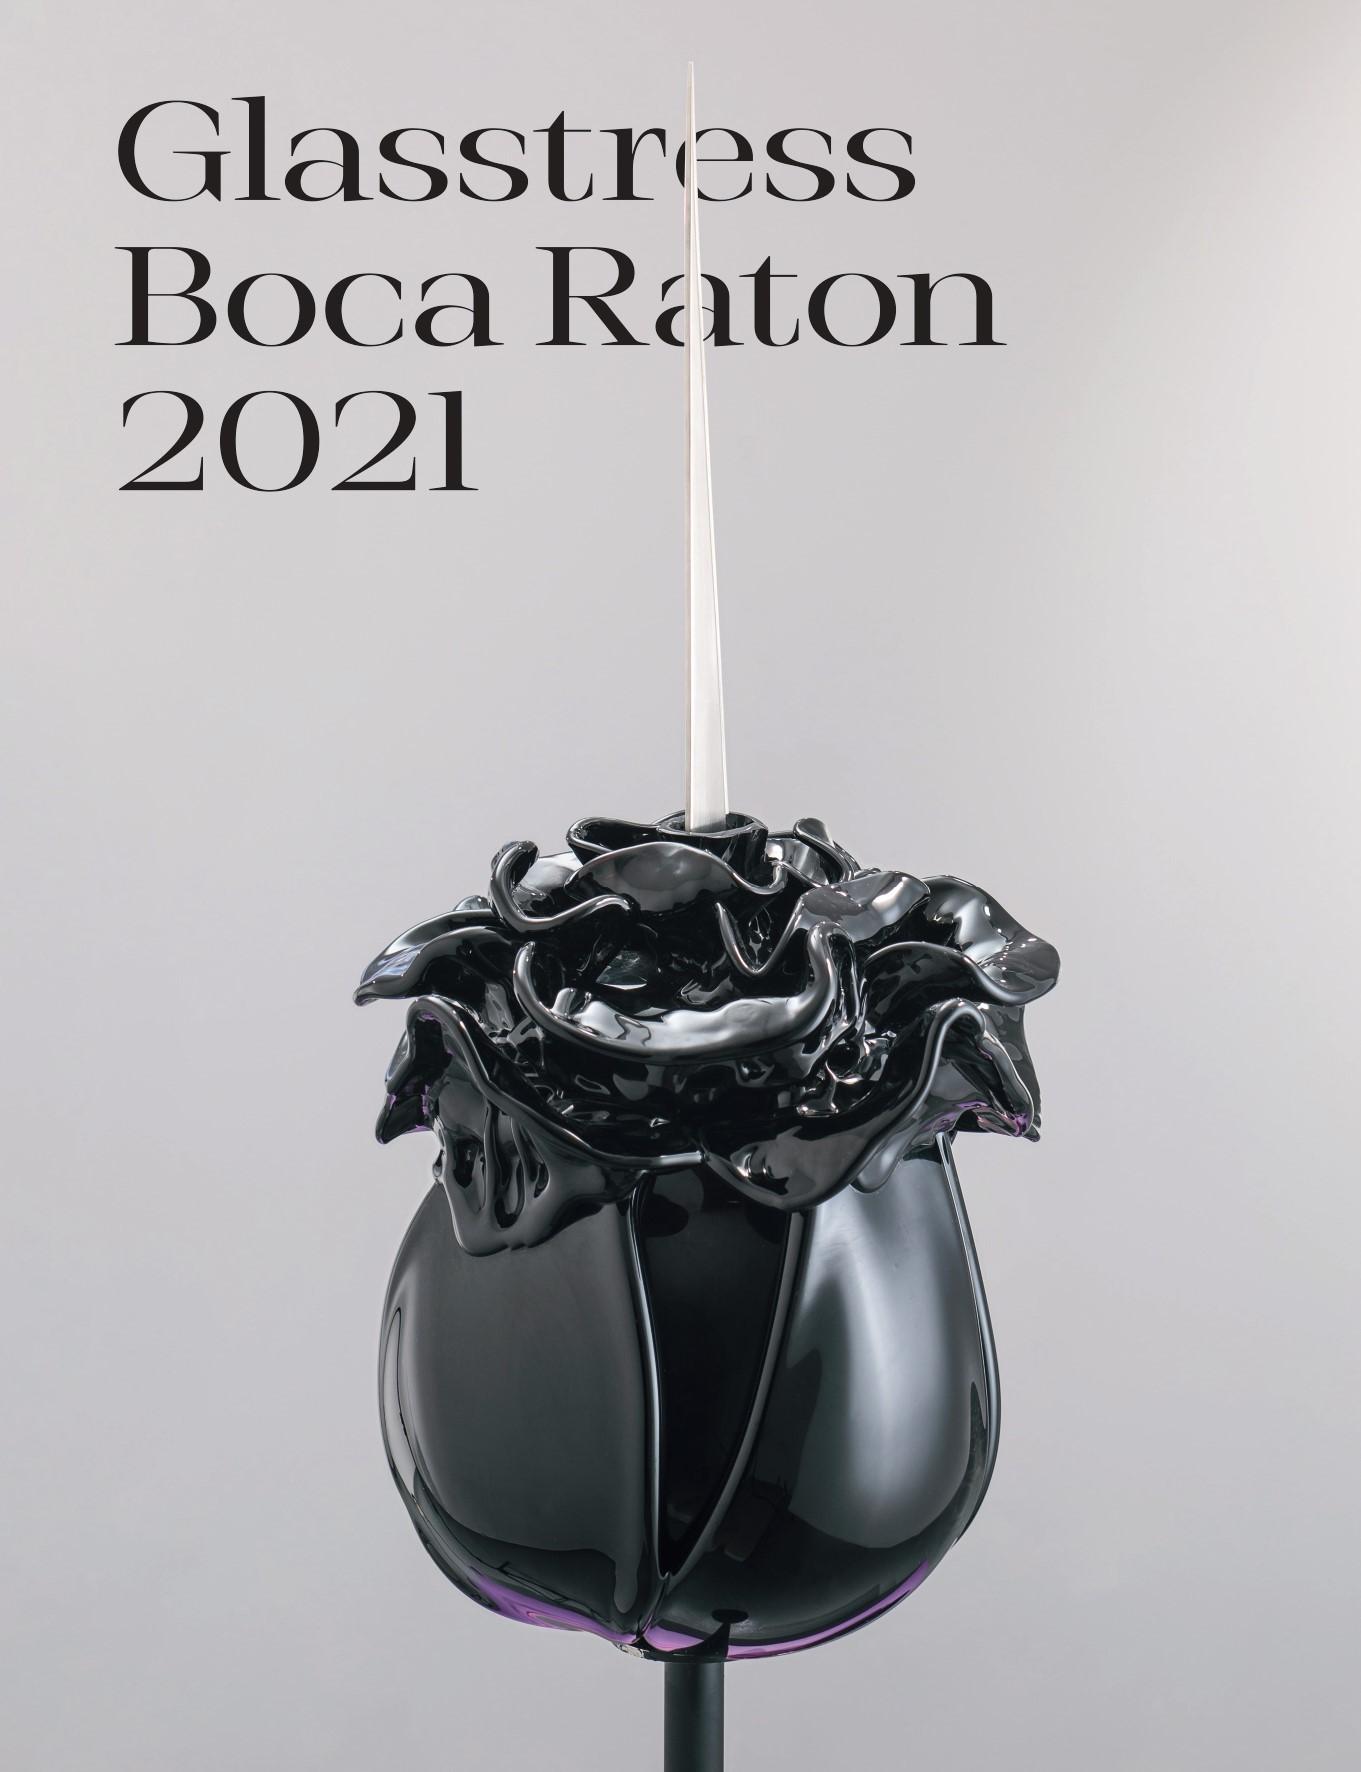 Glasstress Boca Raton Catalogue Cover